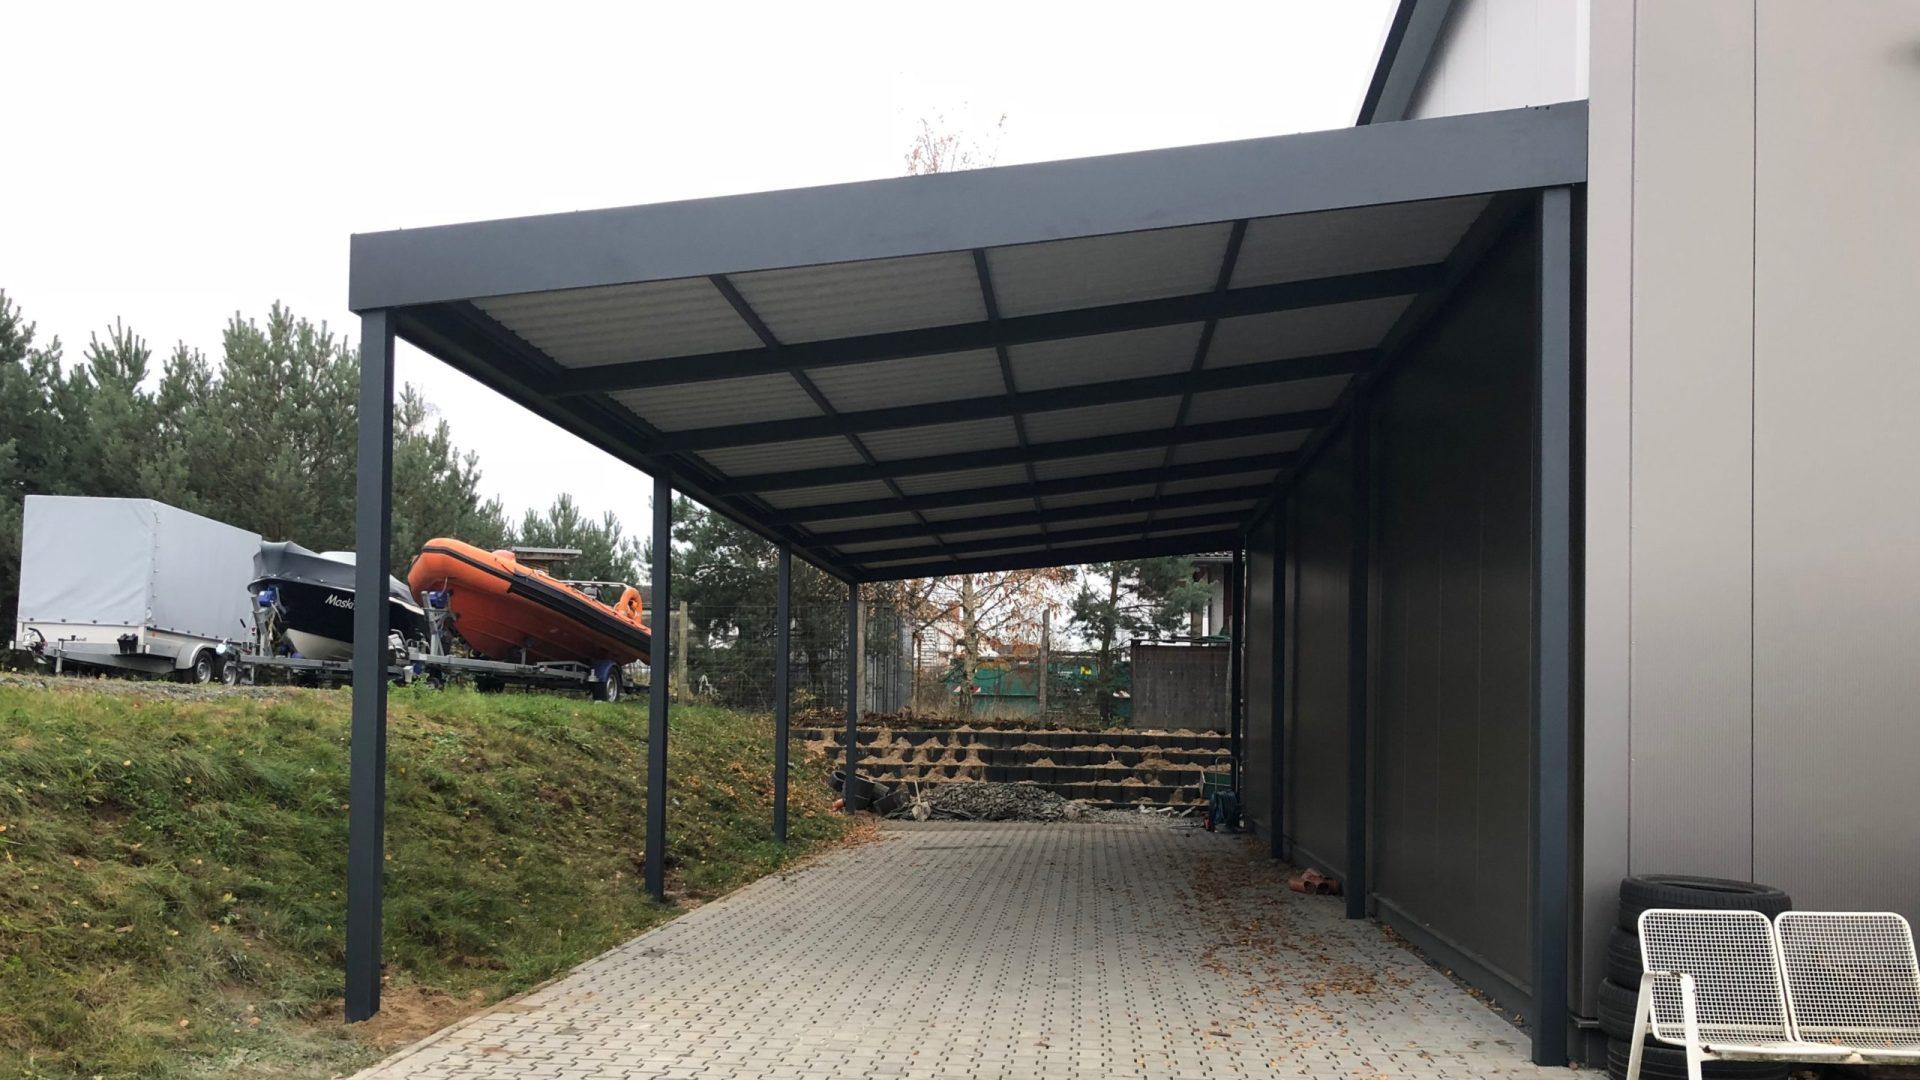 Reihencarport - Carportmaster Projekt 17-P-2019 - 64404 Bickenbach - Carportbild 02